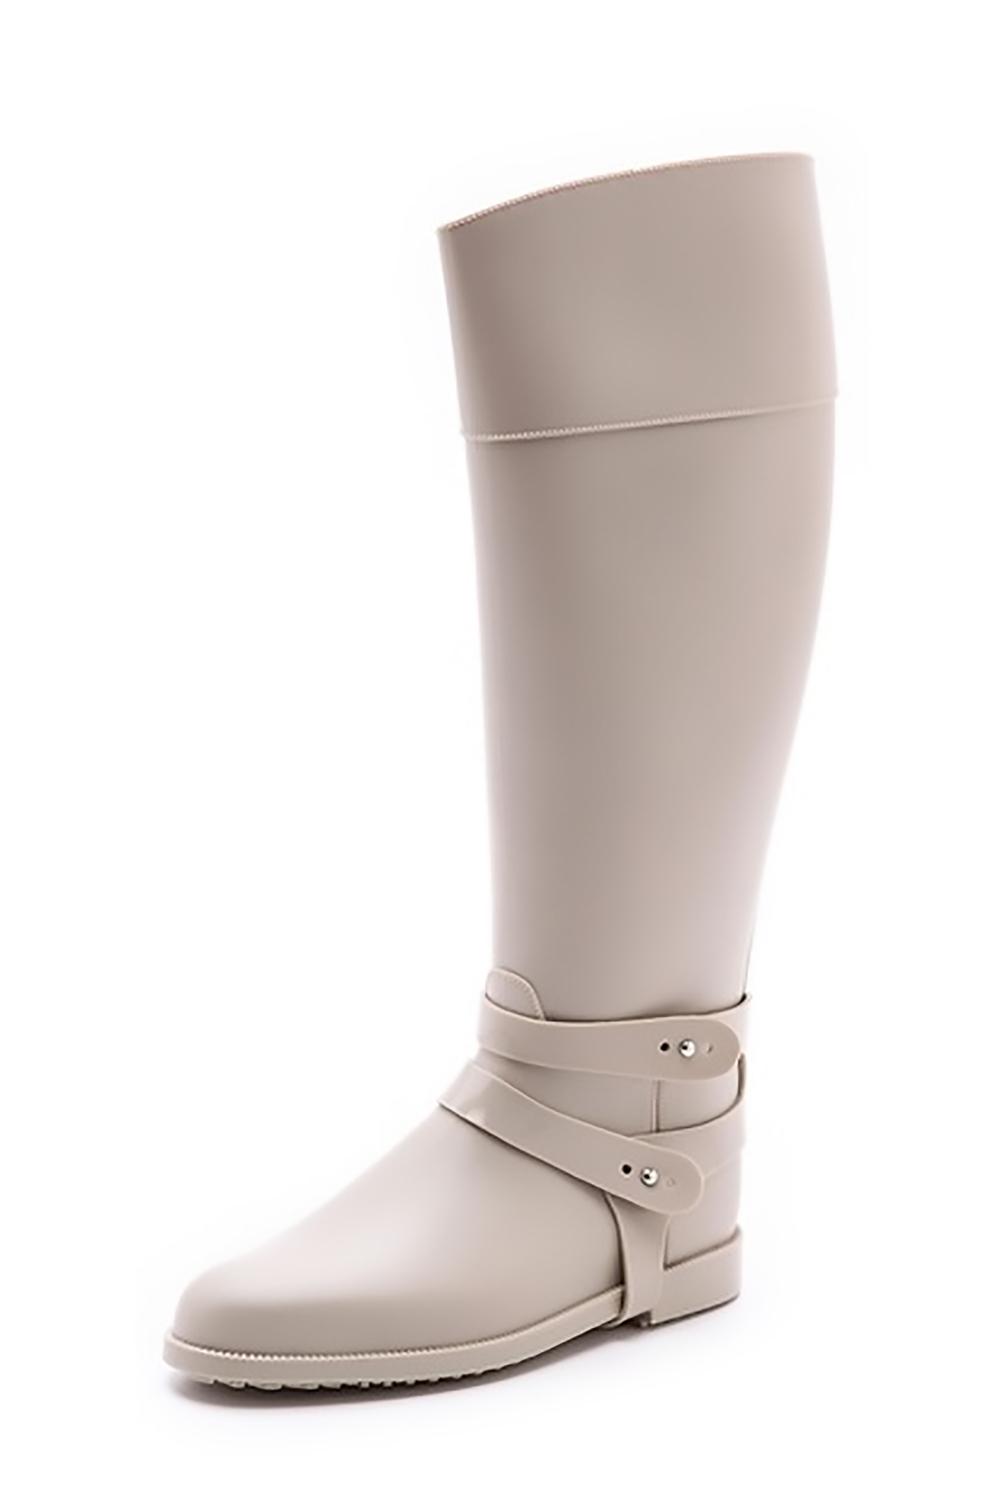 shopbop sloosh italy rain boots rain gear 1500.jpg